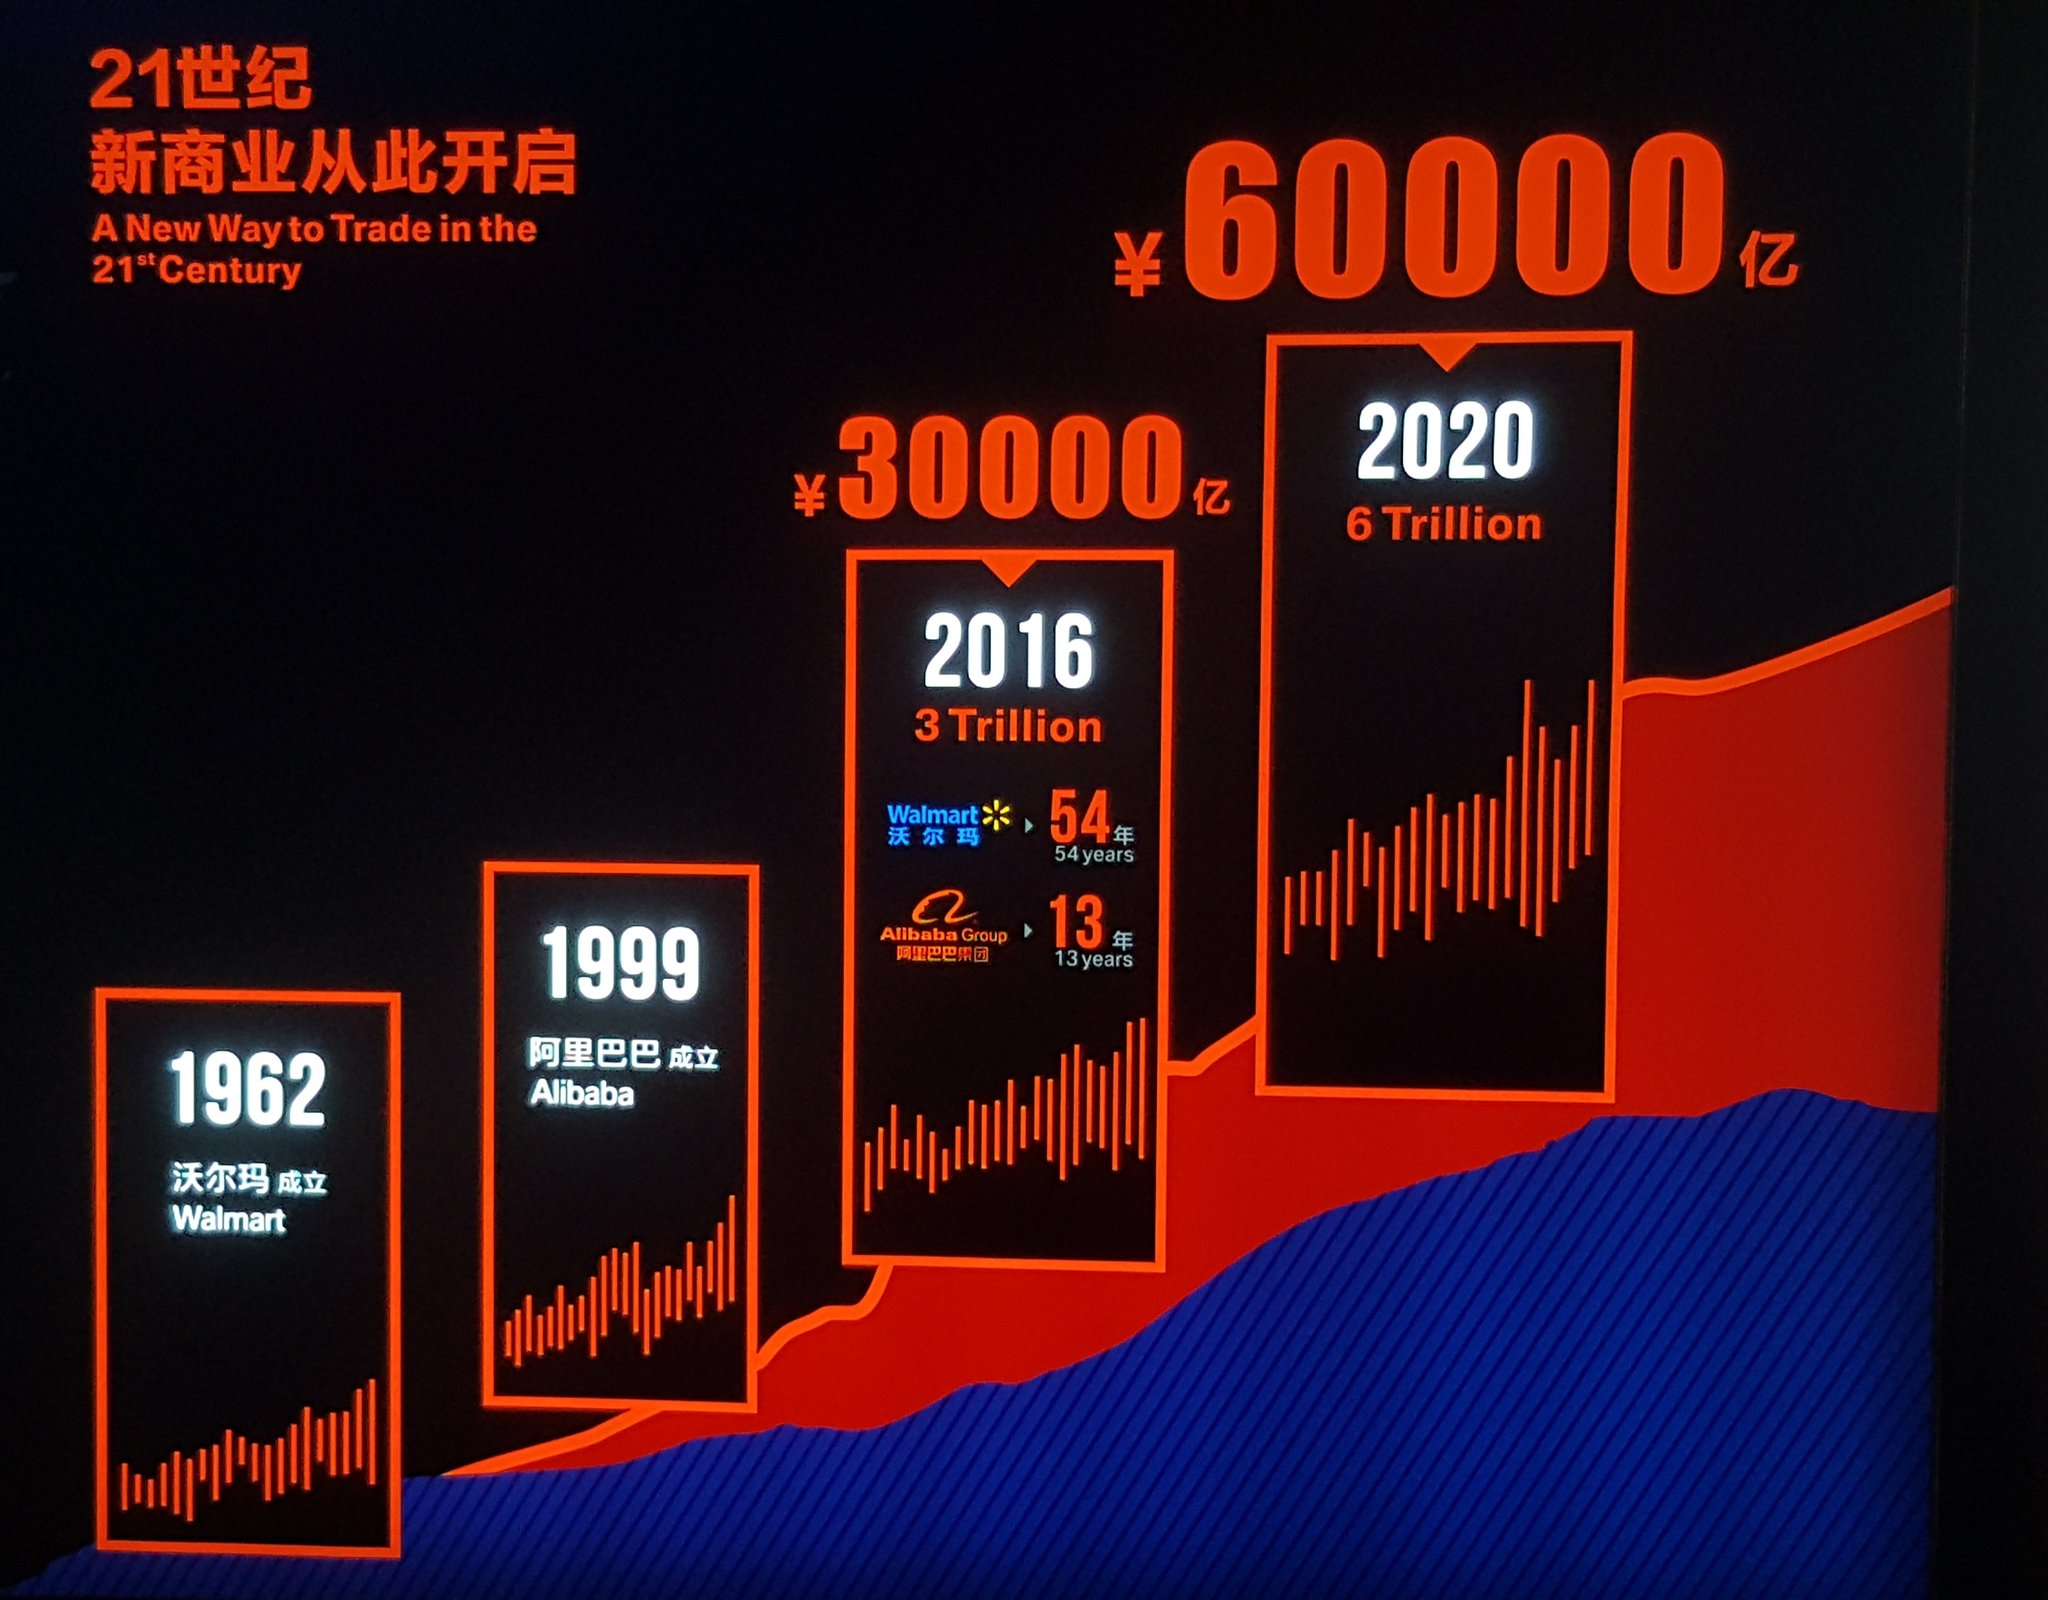 Poltak Hotradero @hotradero Sep 11 Alibaba dan benchmarking dengan Walmart. Offline versus Online.